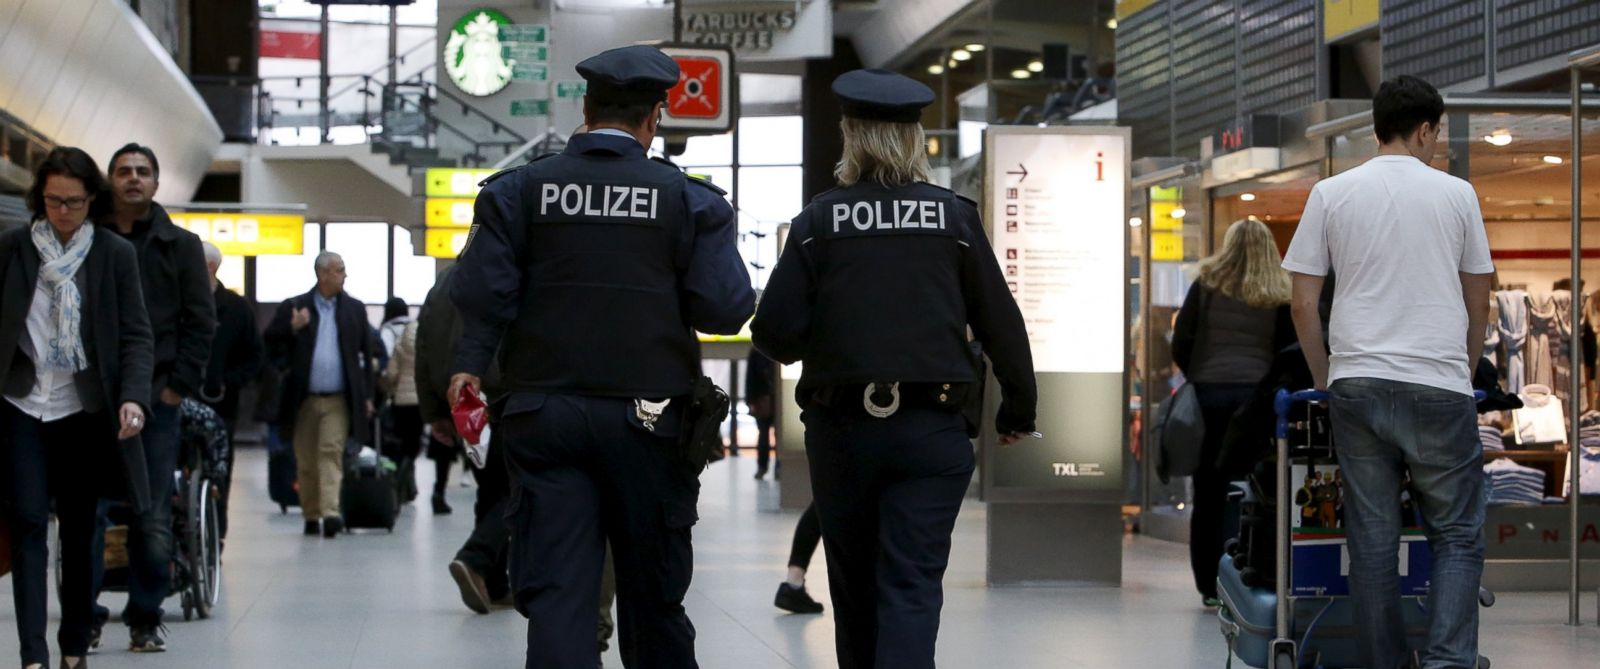 travel news advice terrorist attack brussels safe foreign office belgium